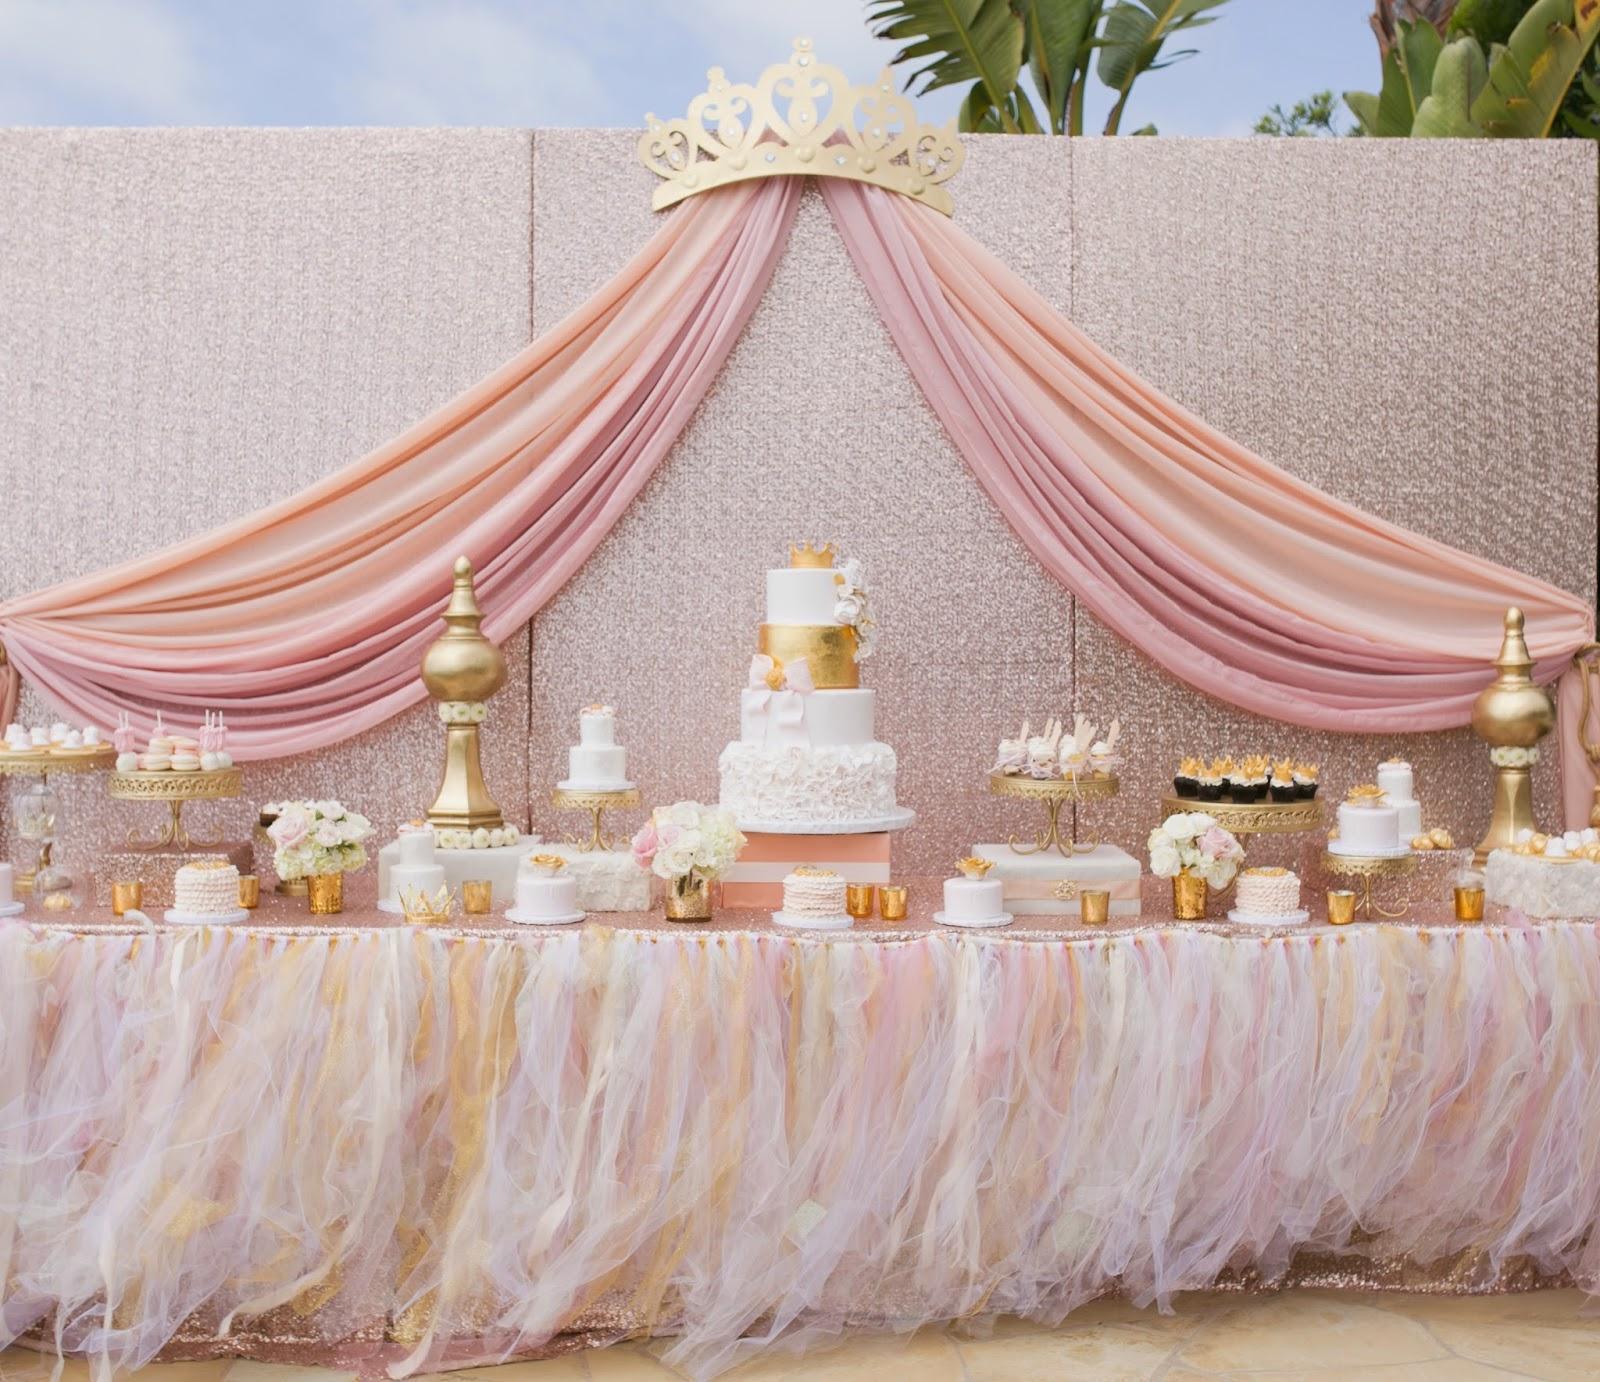 69e47-california_wedding__photogtrapher_jana_williams-31791.jpg